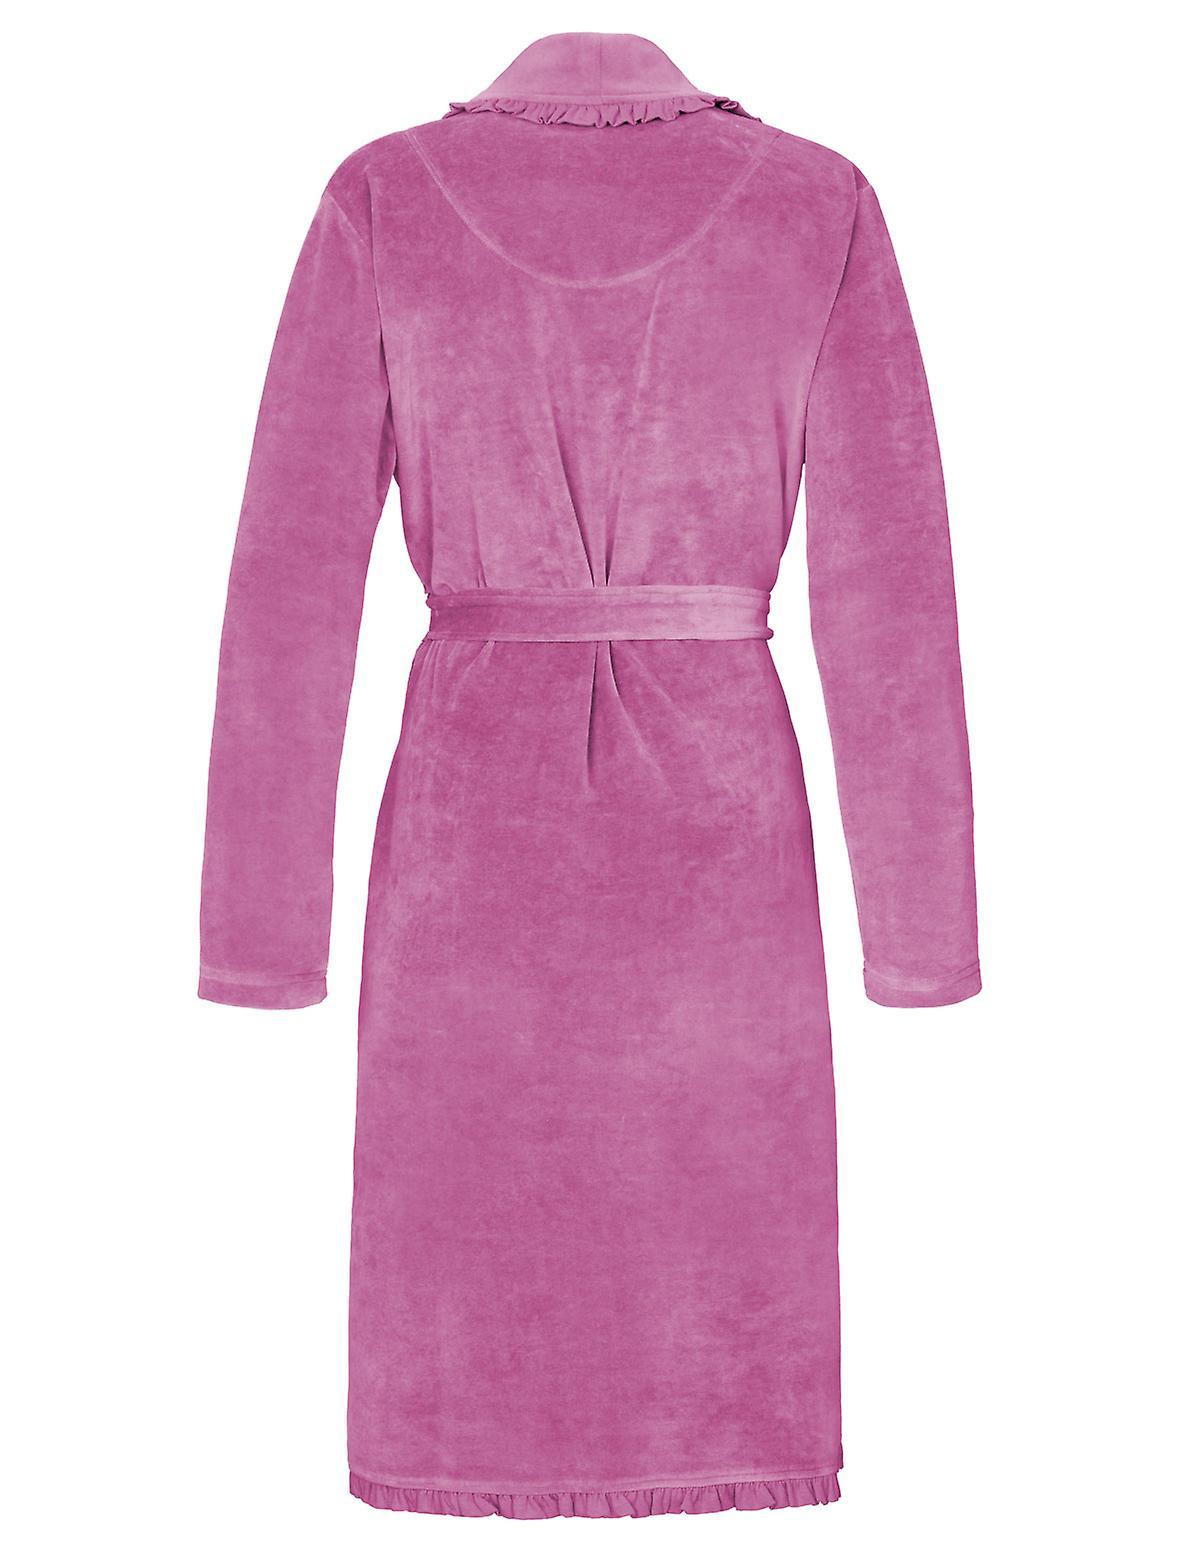 457c7726 Vossen 141555 kvinners Ariel slåbrok Loungewear kappe badekåpe | Fruugo